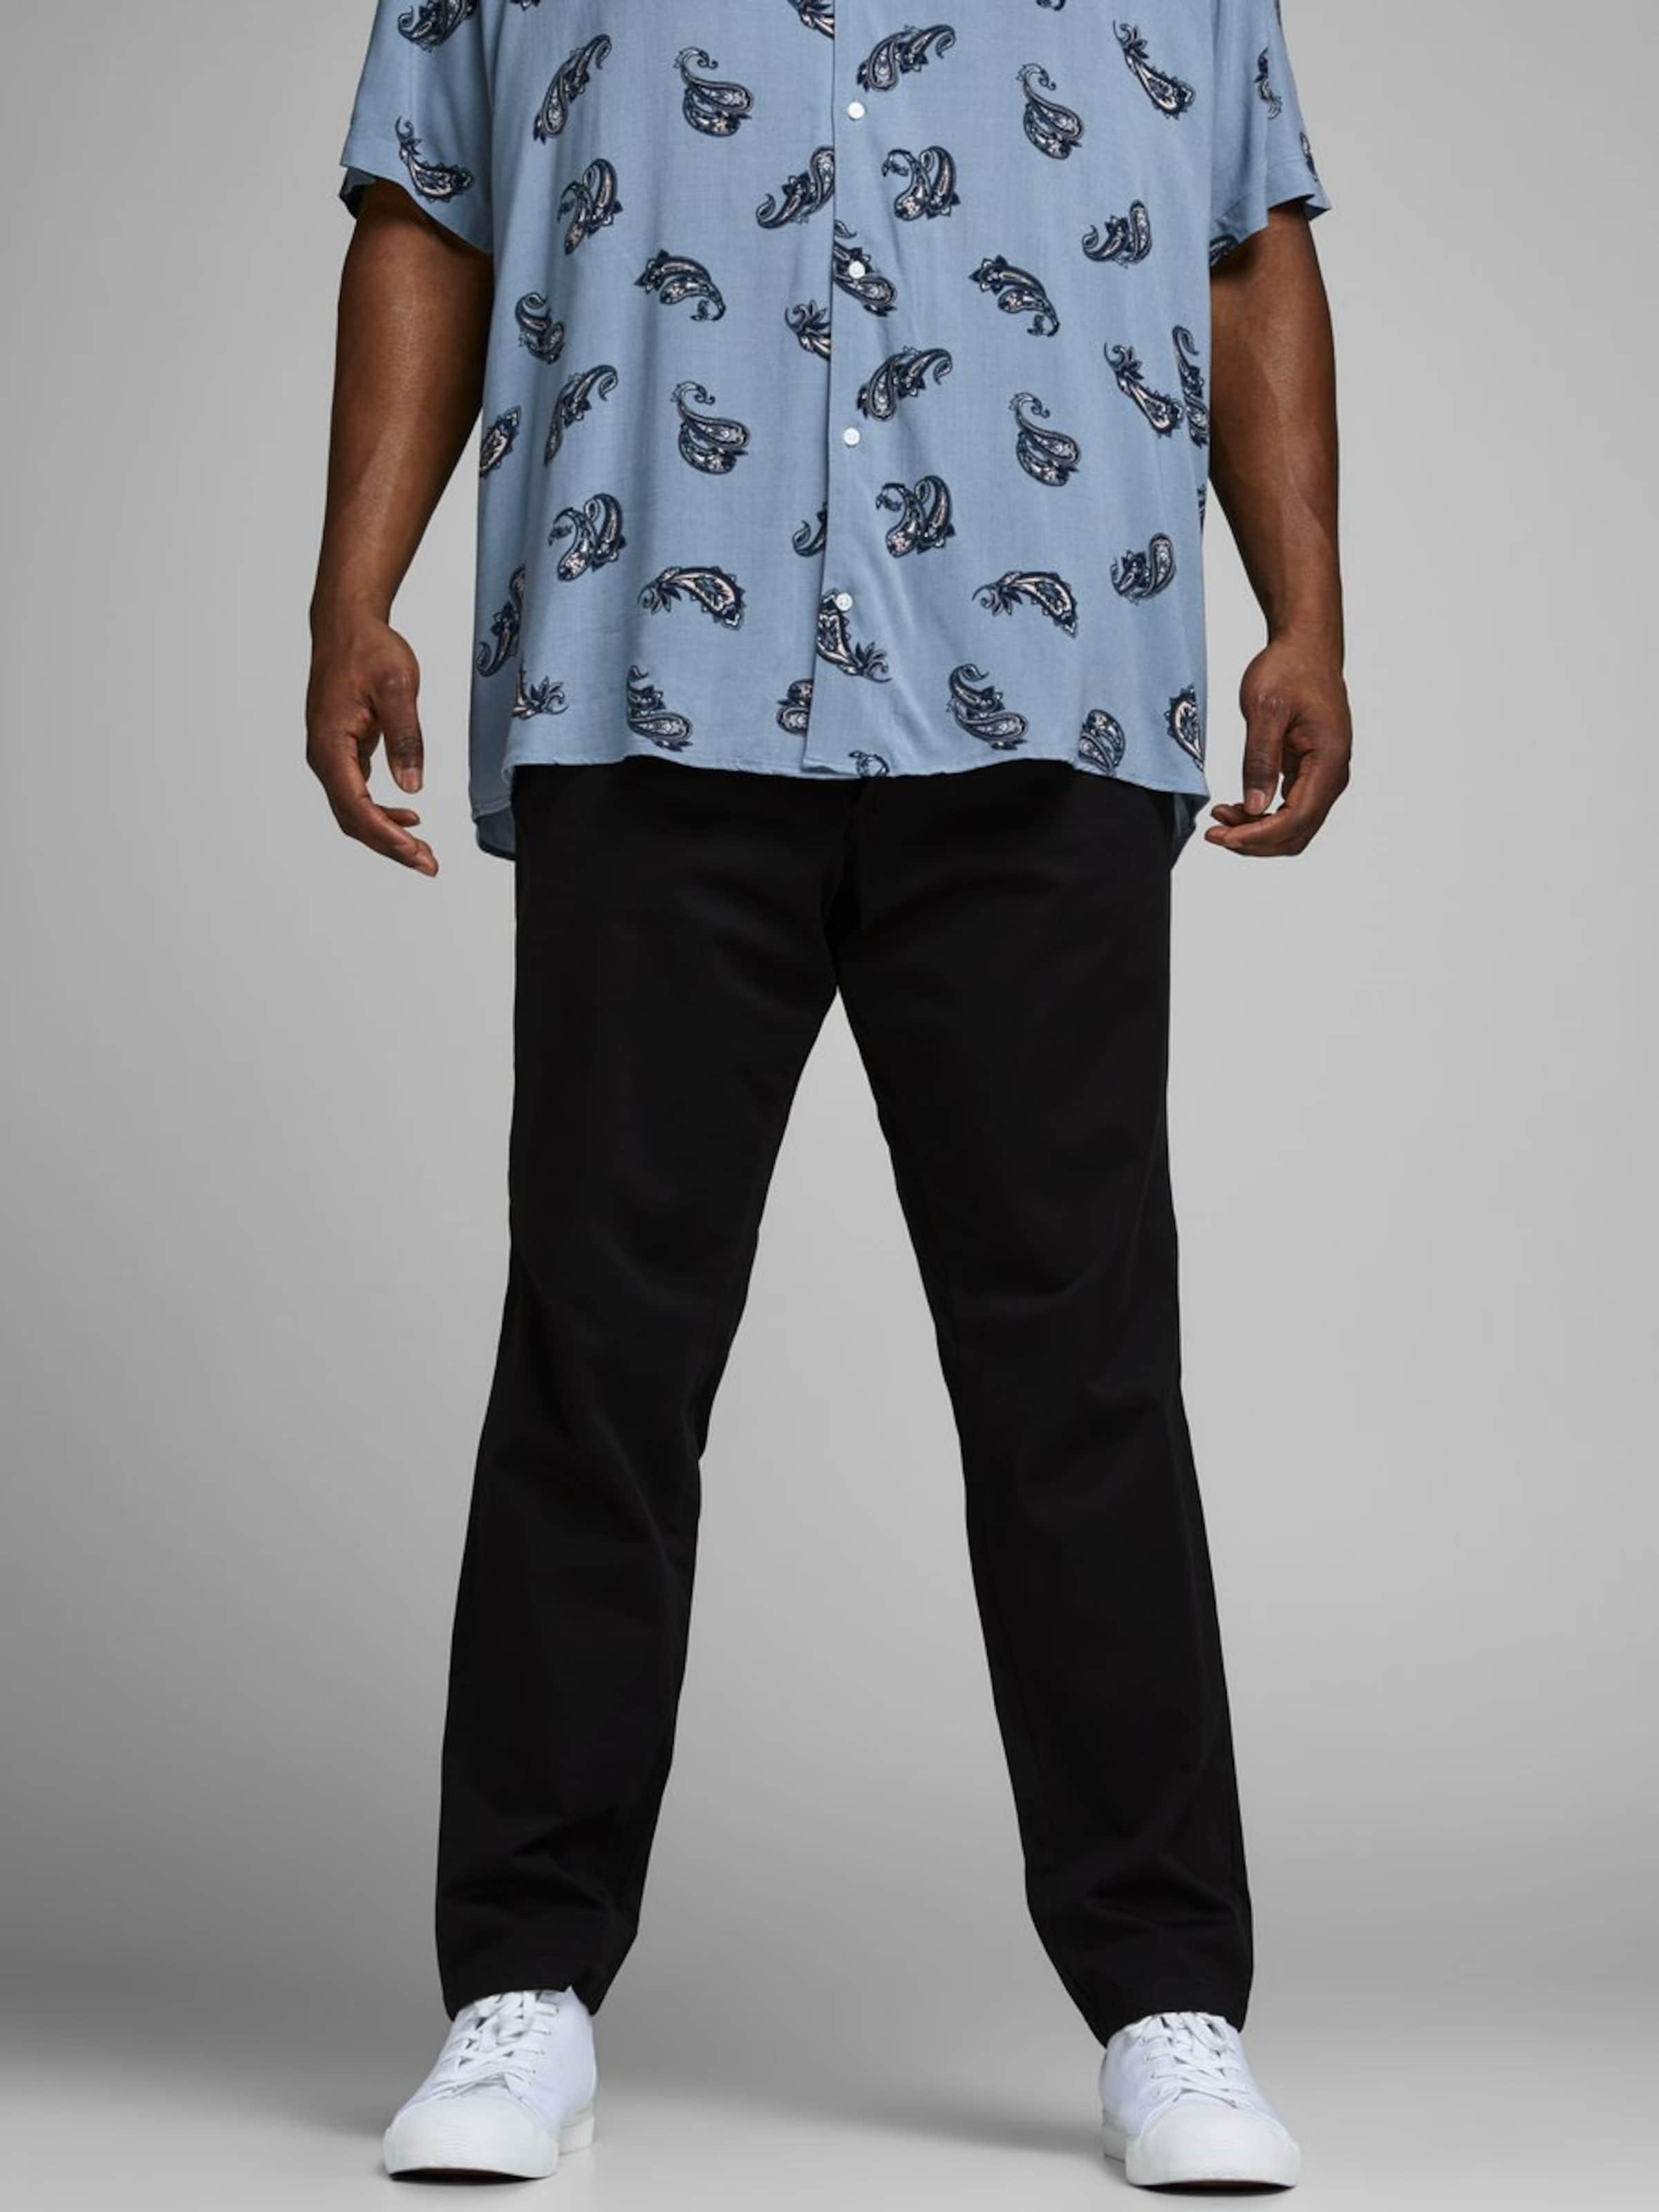 Noir Pantalon Chino En Jackamp; Jones ZXkiPu